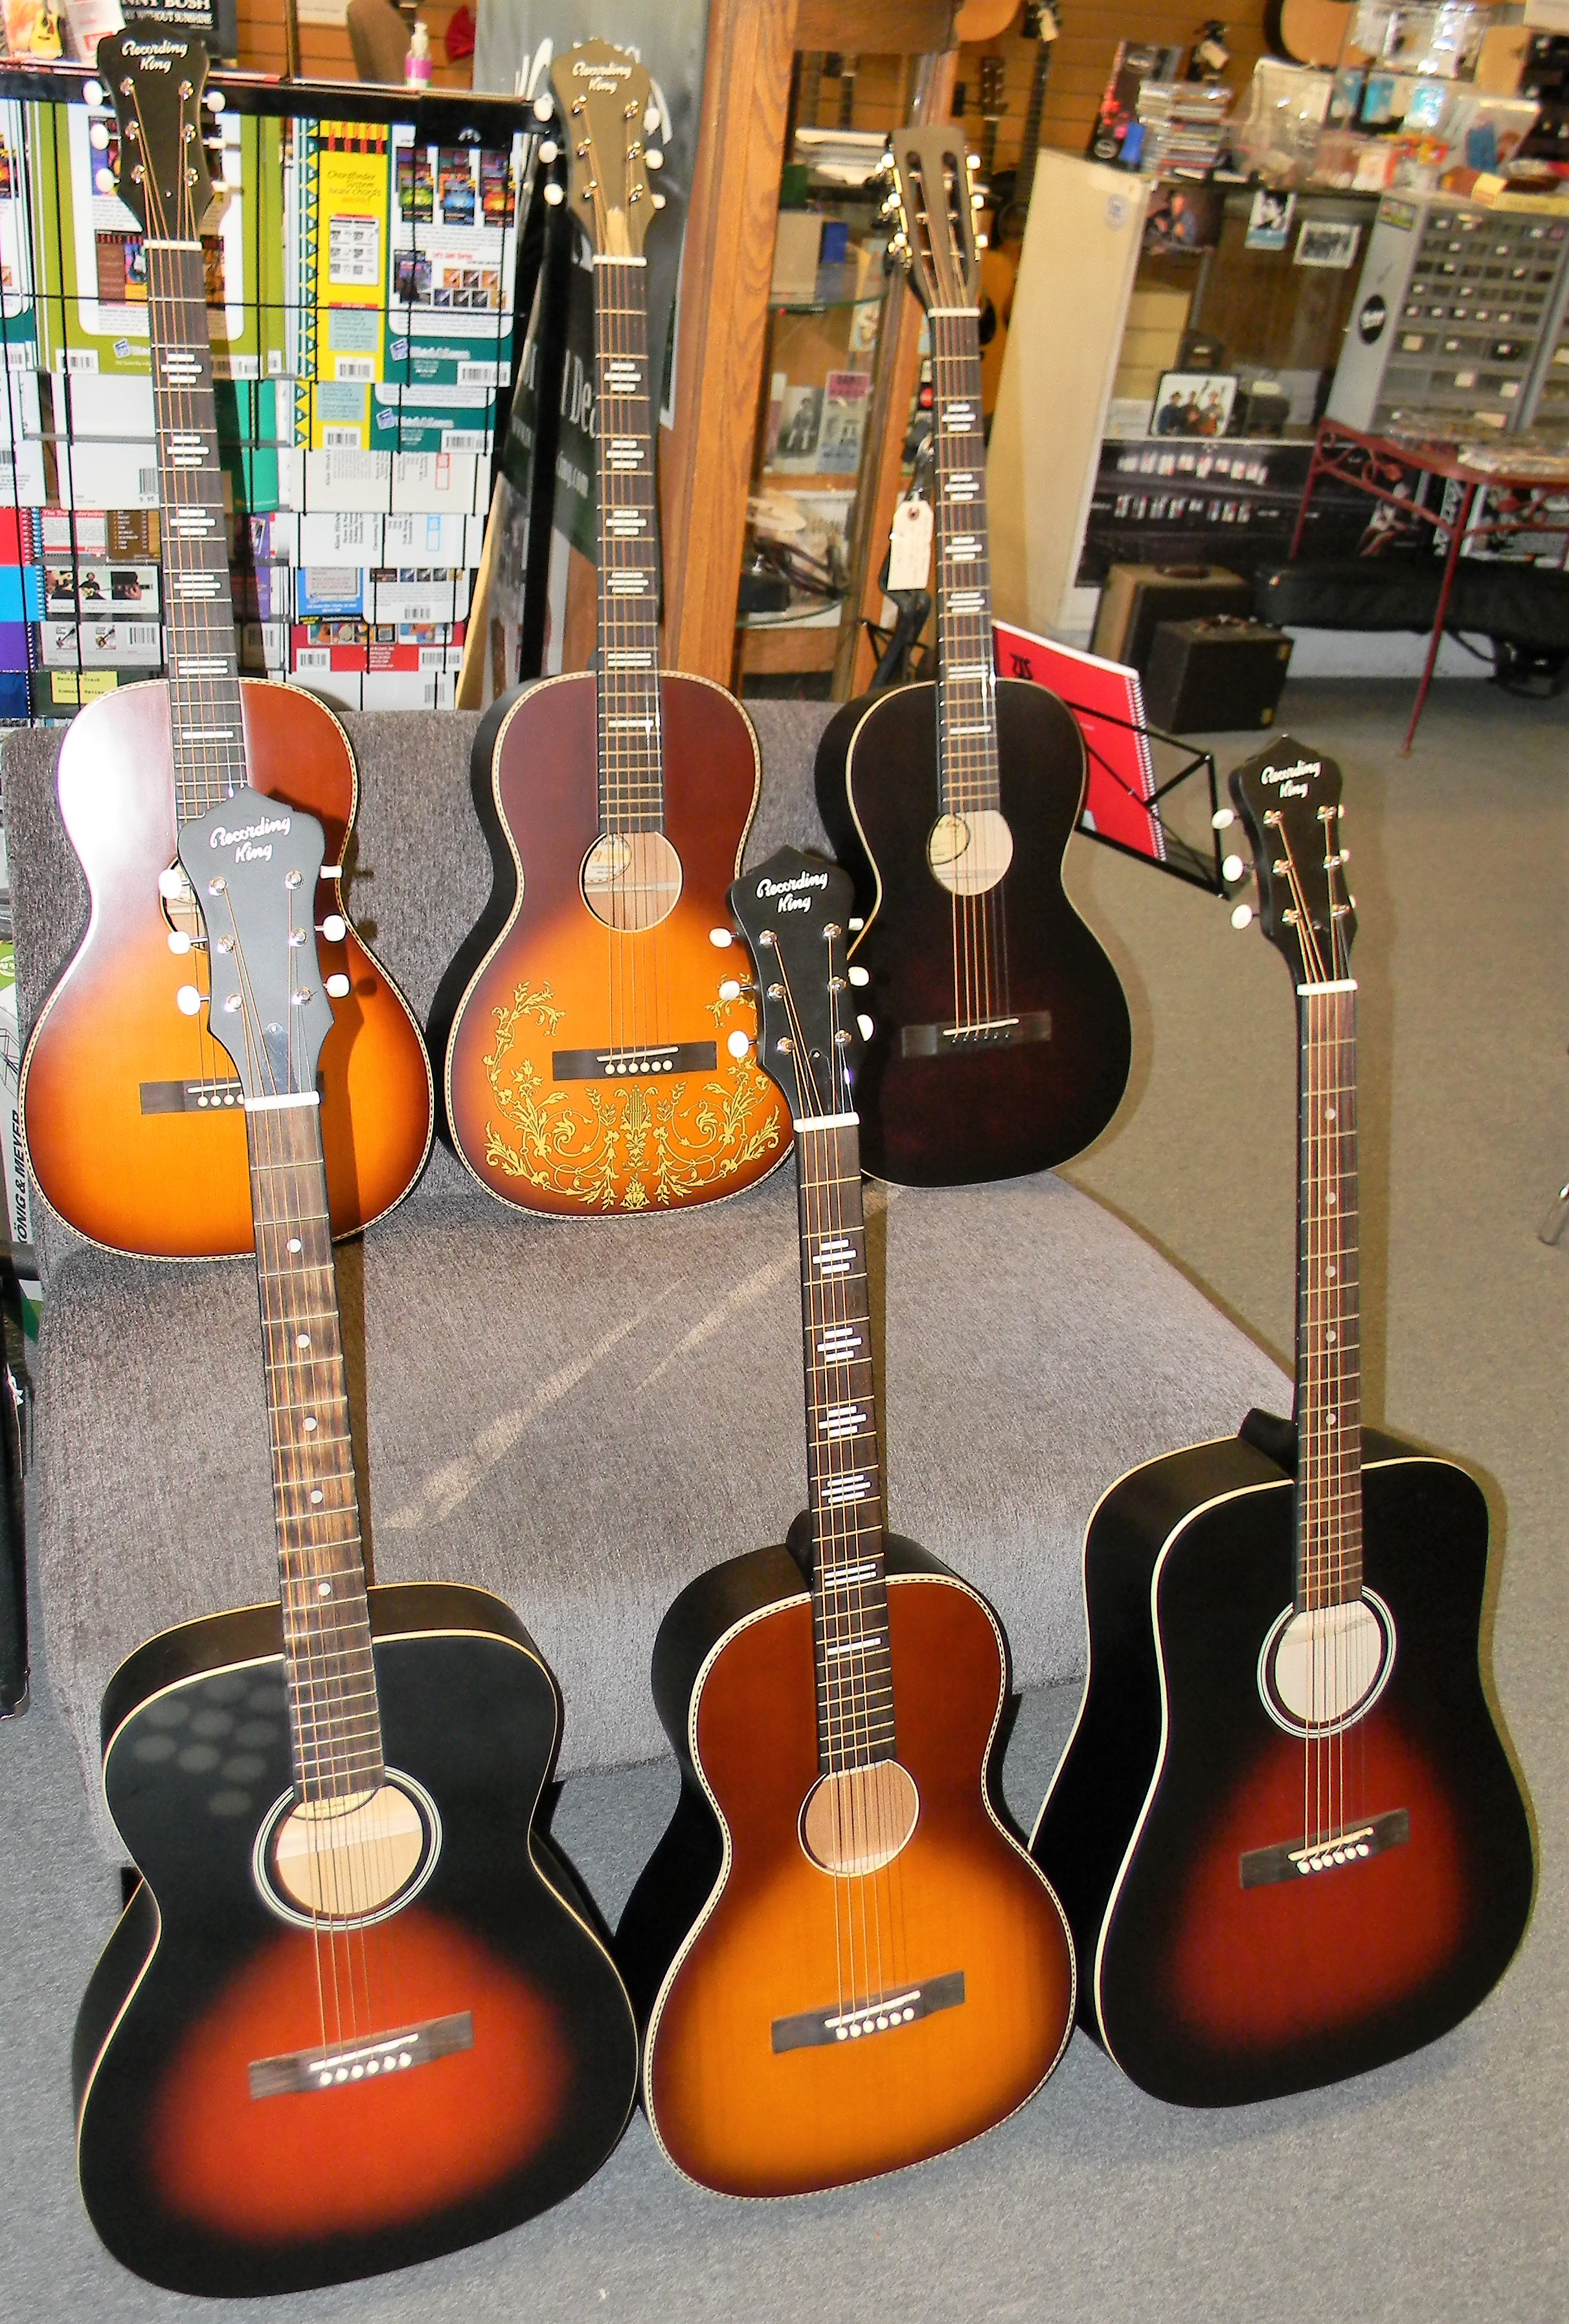 dscn5194 san antonio guitar store guitar tex. Black Bedroom Furniture Sets. Home Design Ideas